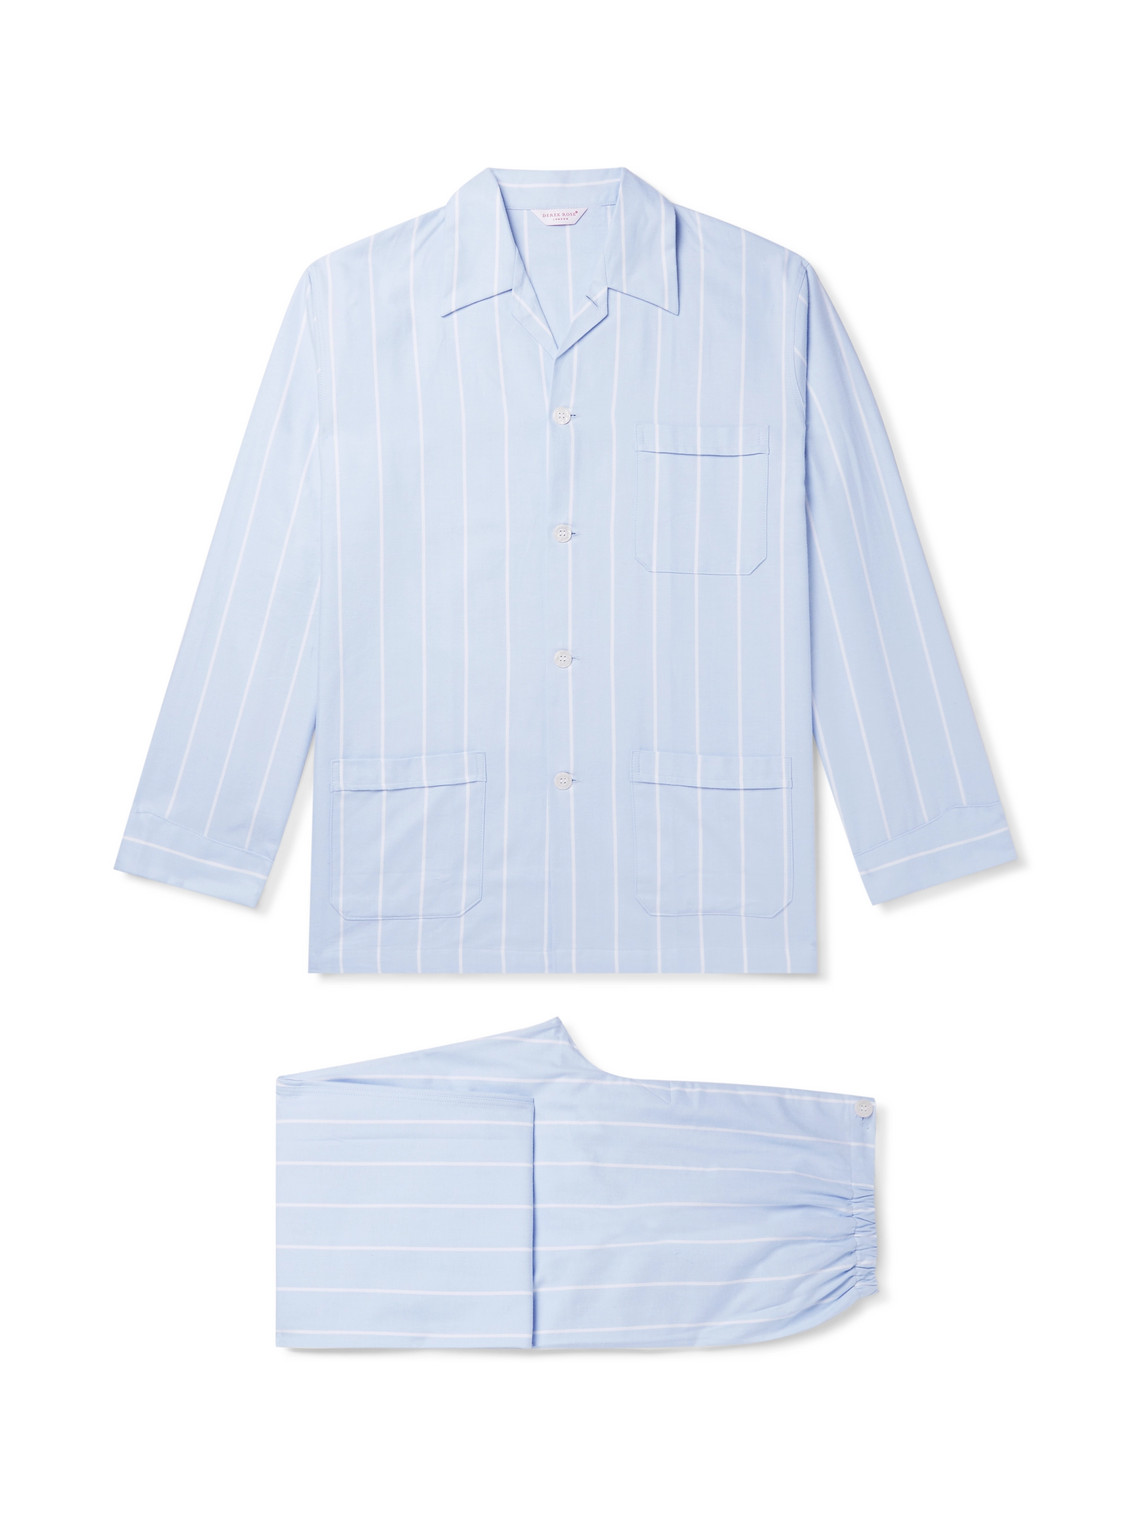 derek rose - striped brushed cotton-twill pyjama set - men - blue - s